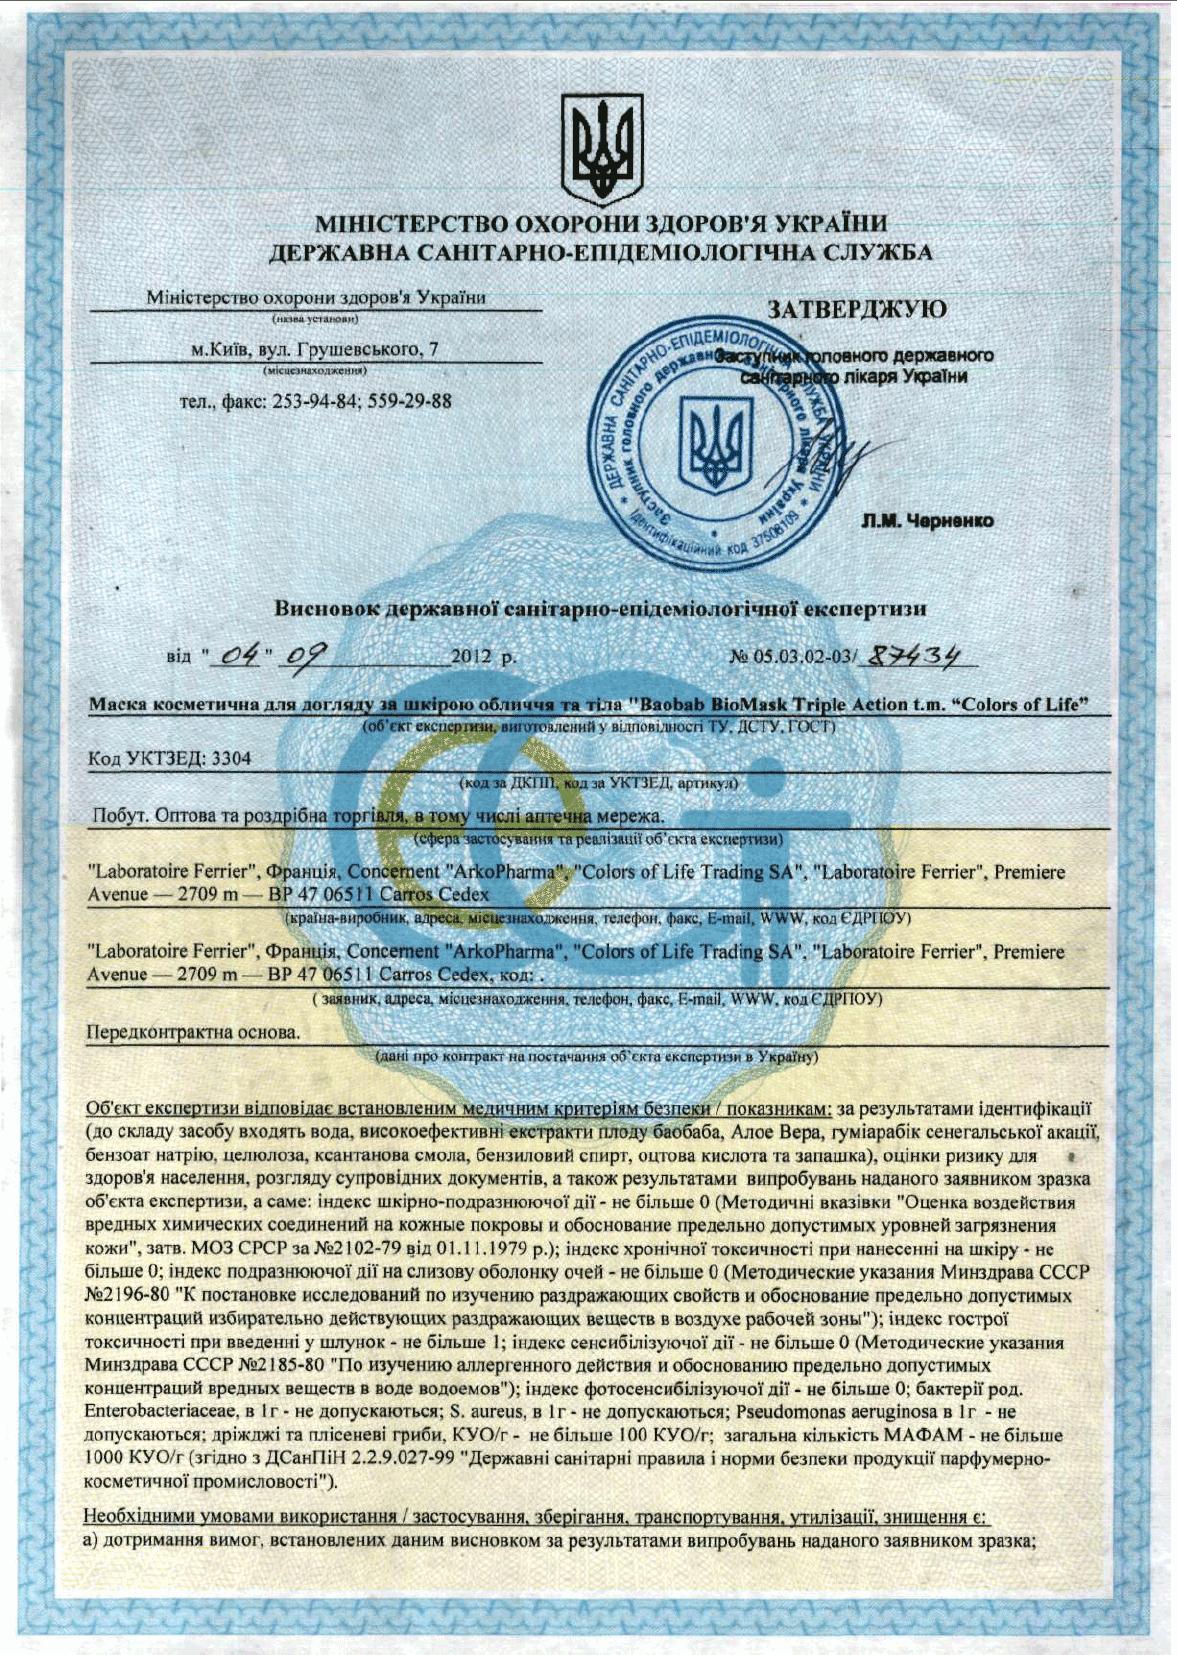 Заключение МОЗ Украины на соответствии Baobab Biomask компании Colors of Life требованиям (стр 1)